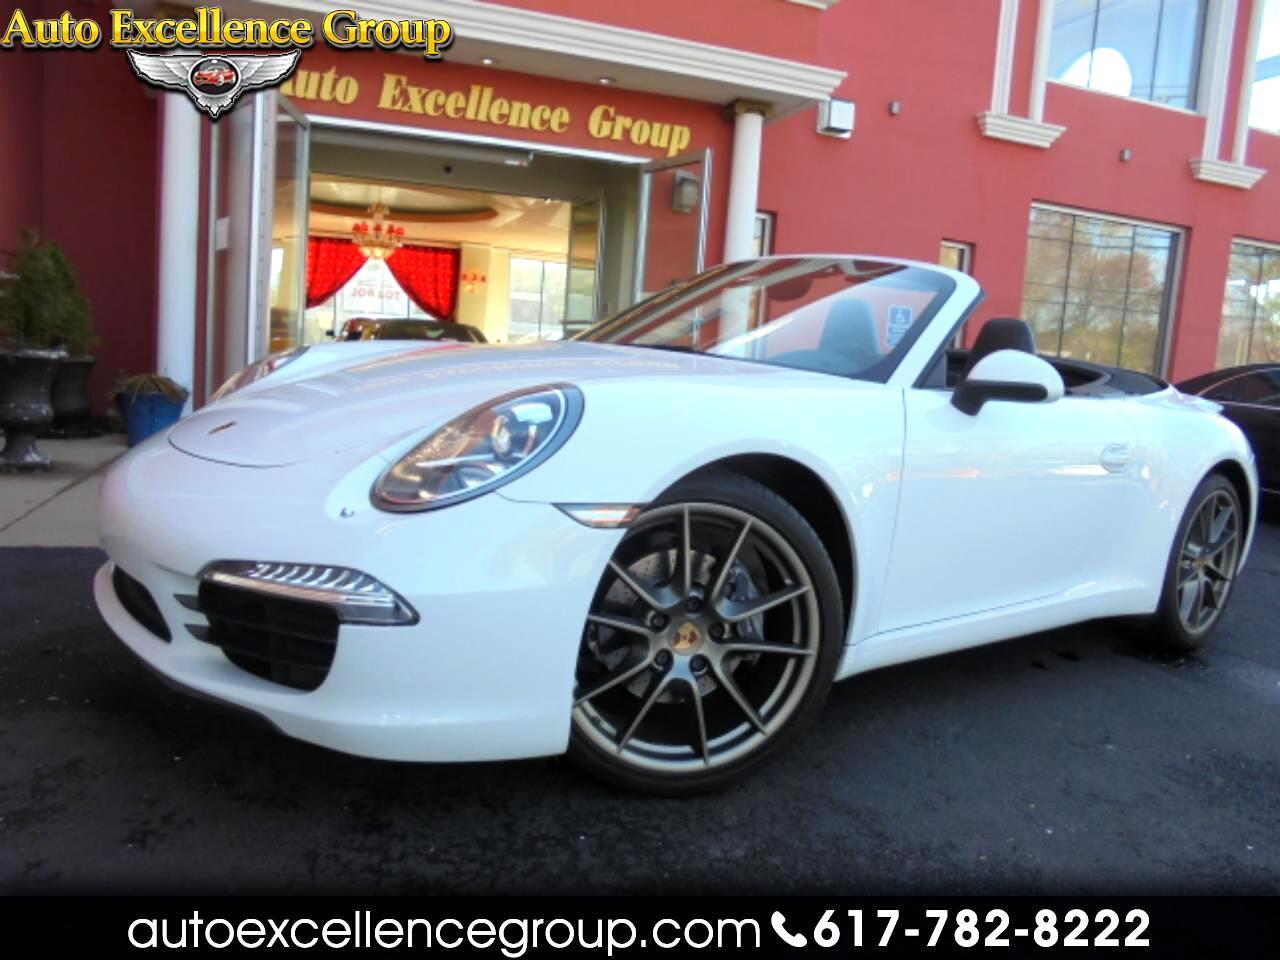 Porsche 911 Carrera Cabriolet 2014